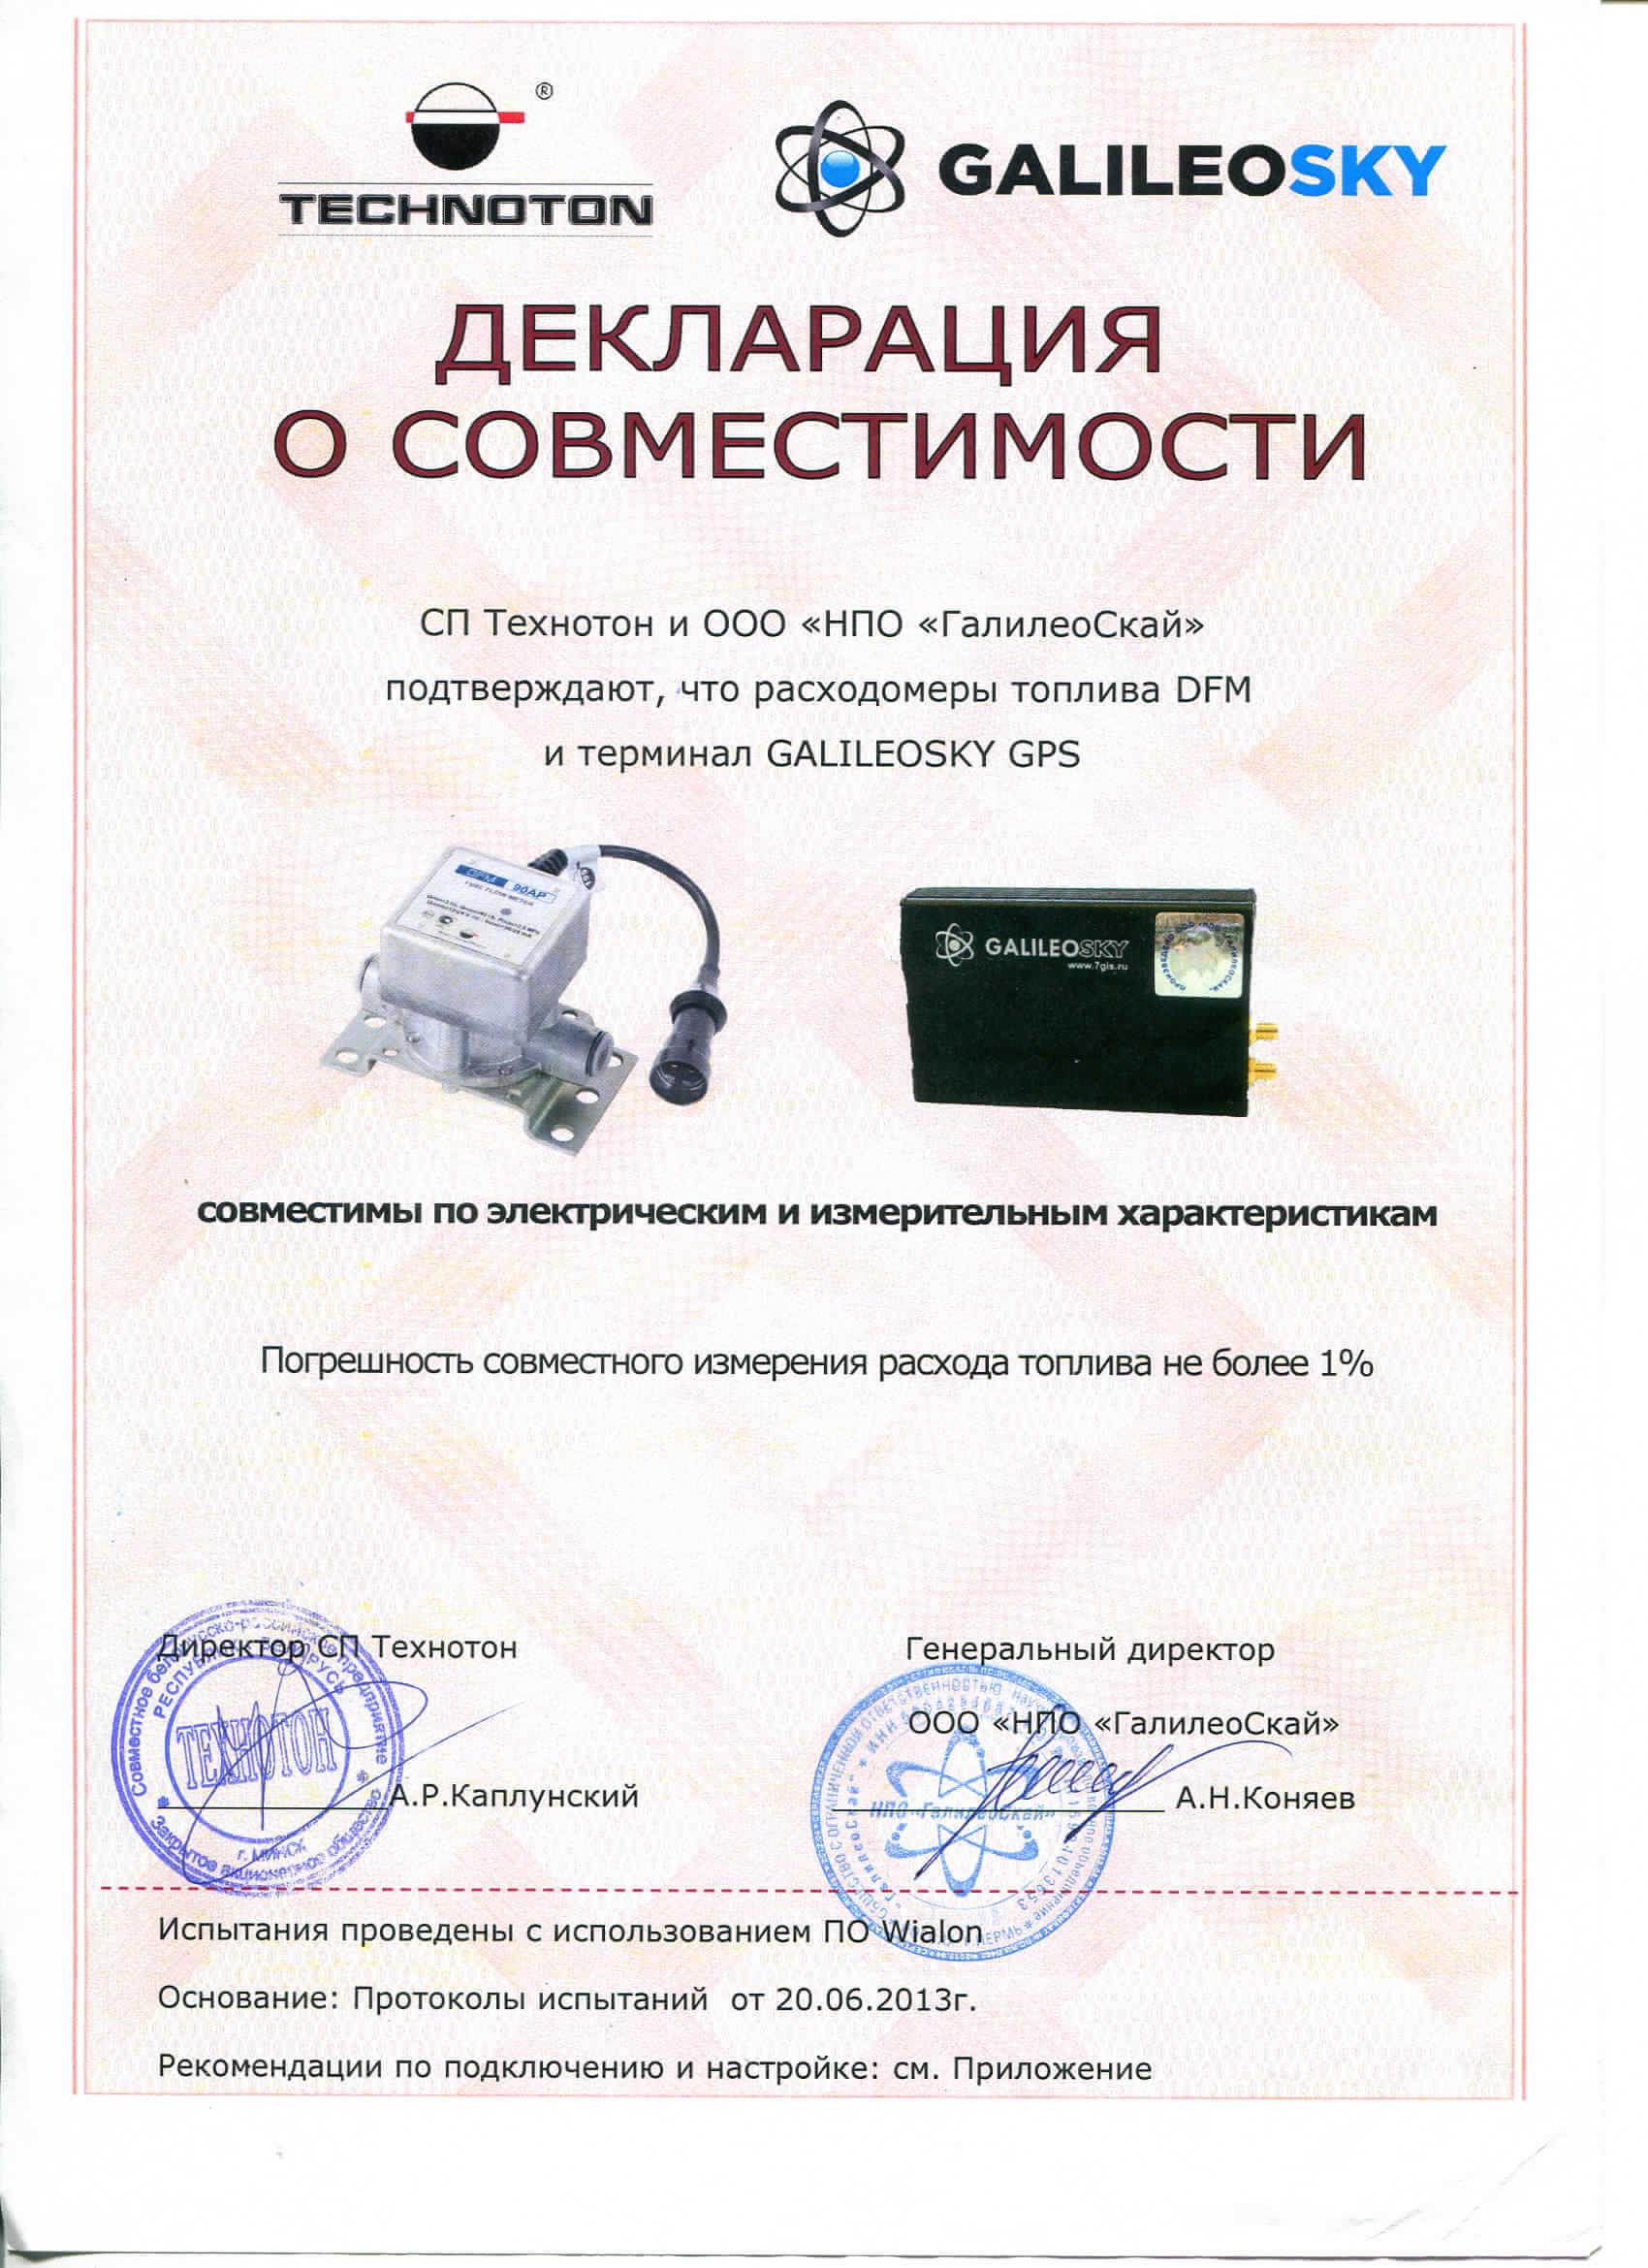 galileosky gps compatible with technoton dfm ap rus technoton. Black Bedroom Furniture Sets. Home Design Ideas